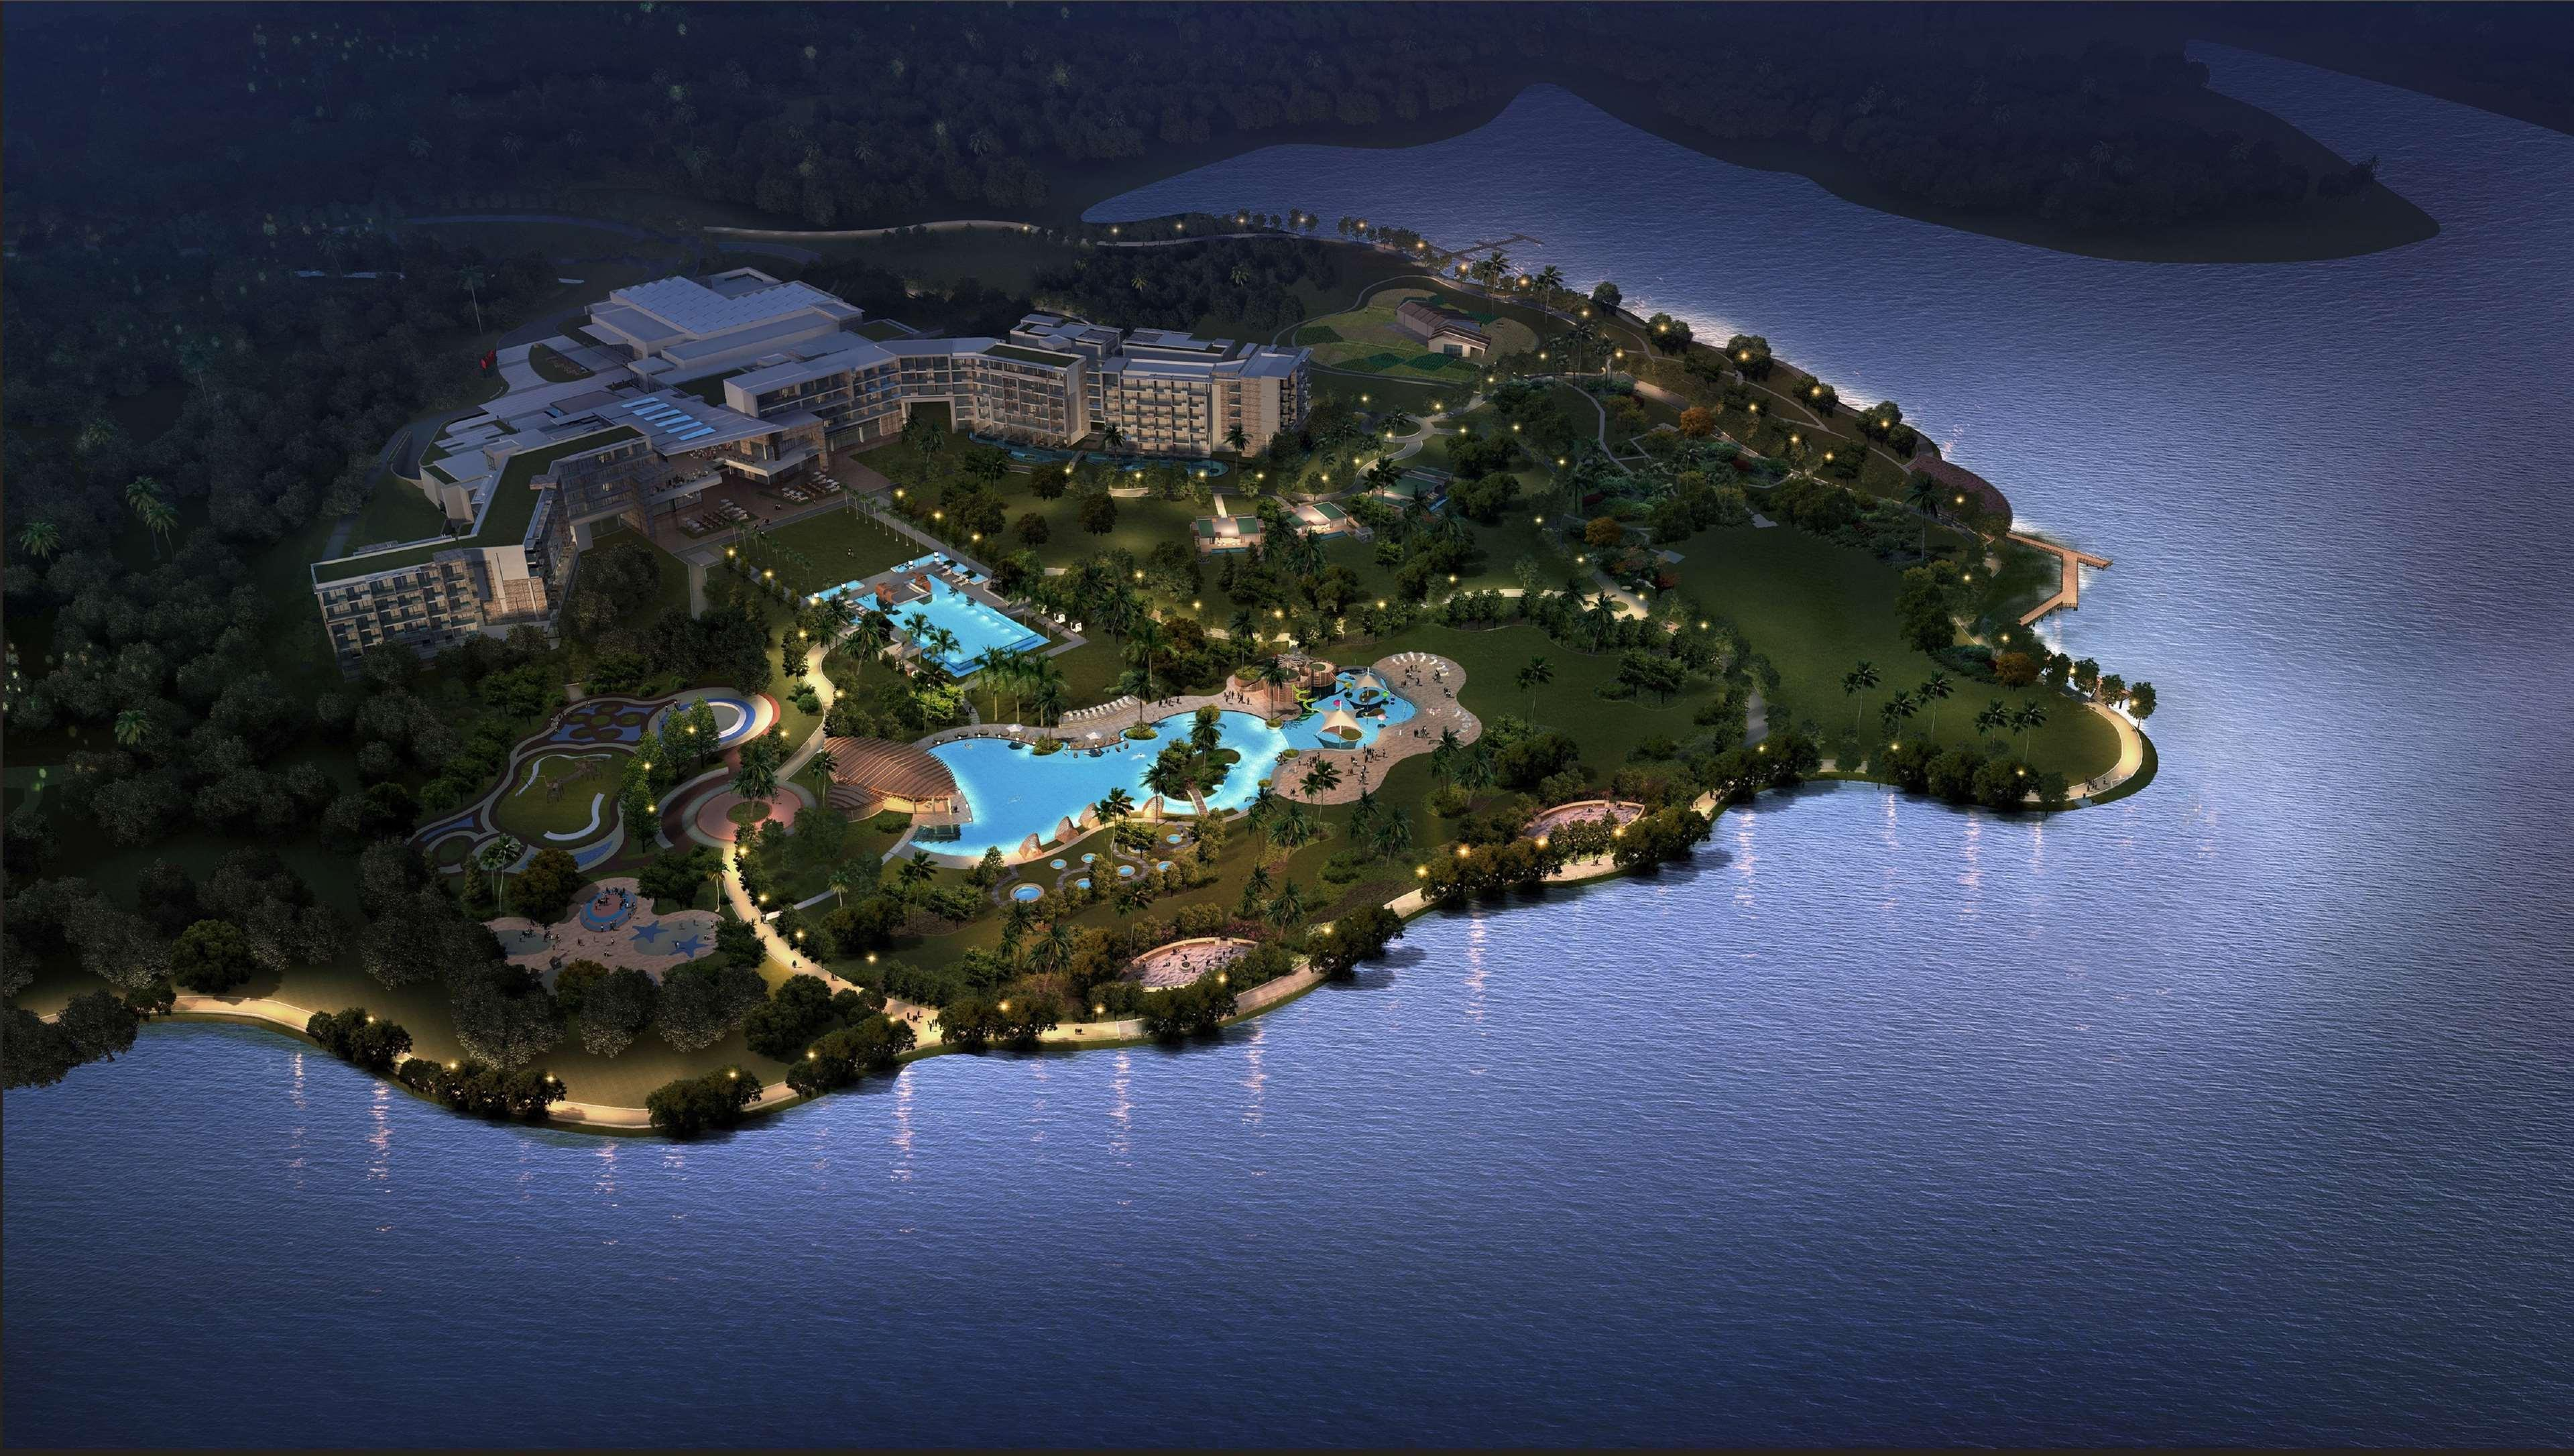 DoubleTree by Hilton Wanning, Hainan